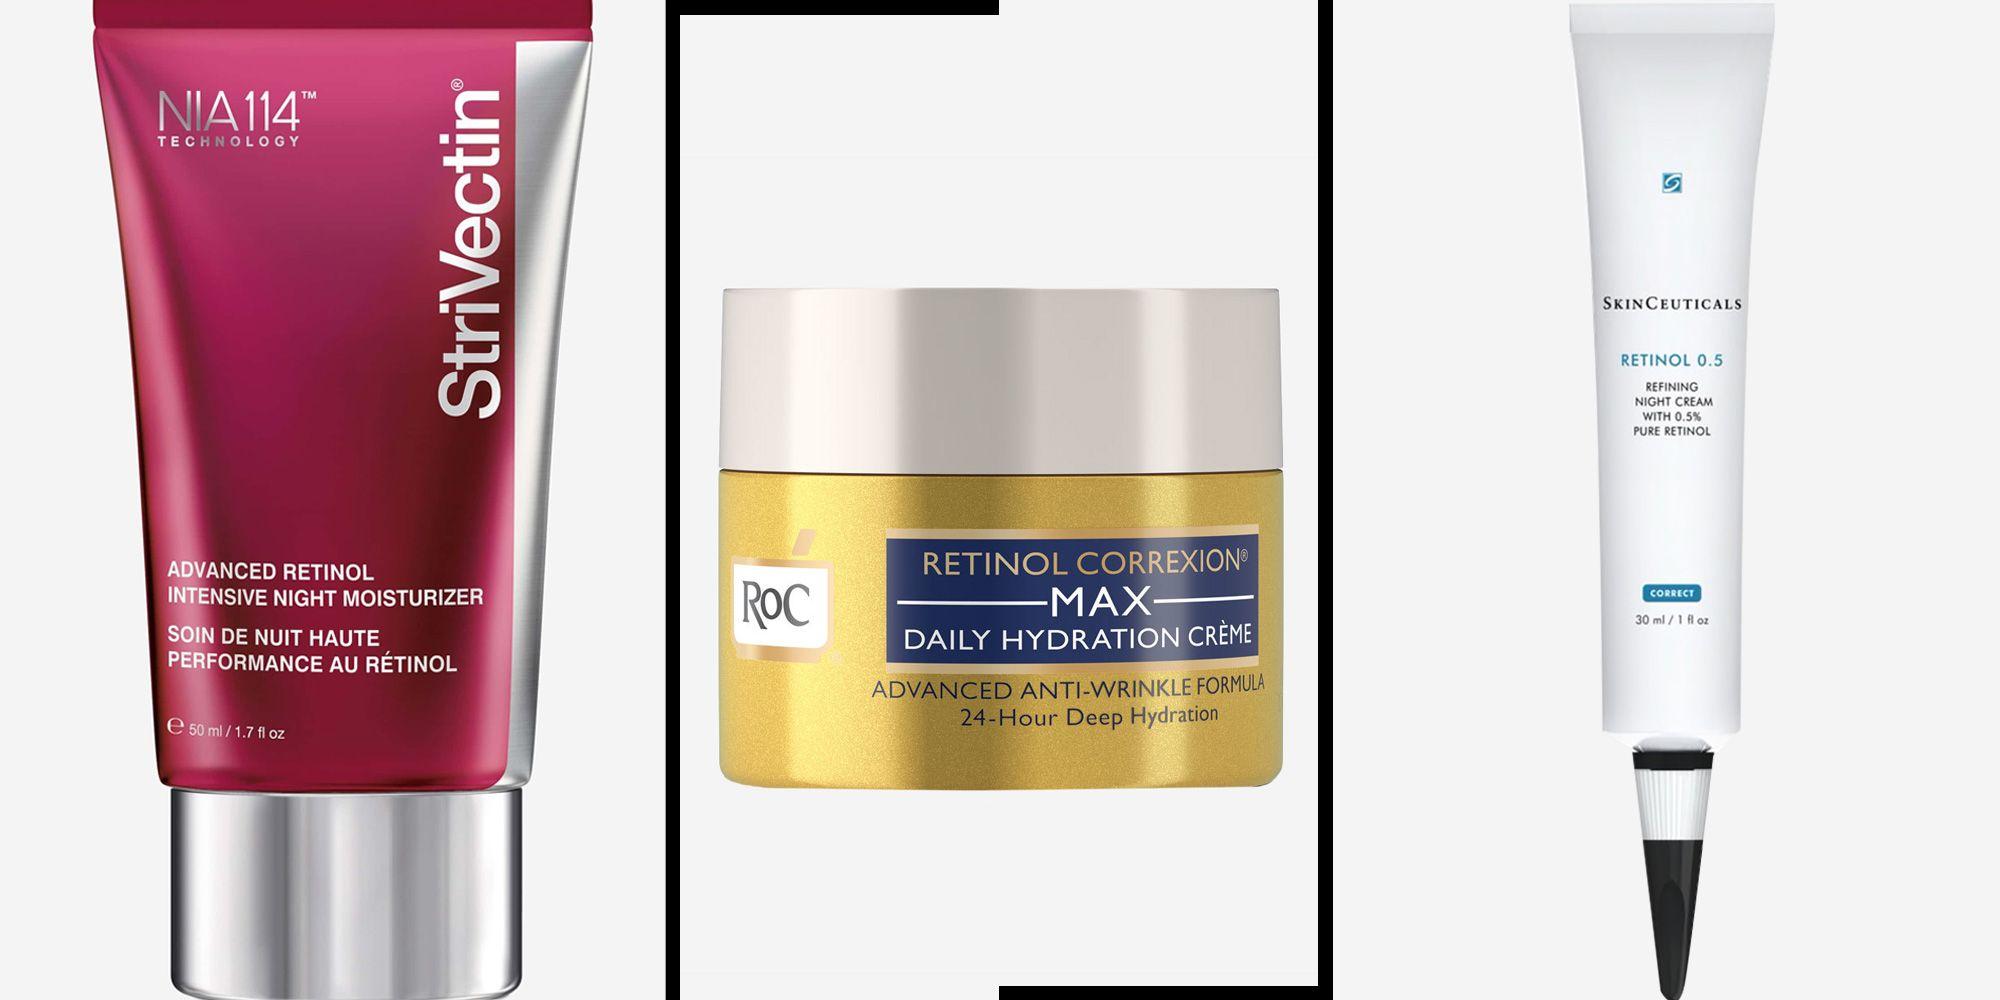 190362fe36 The 10 Best Retinol Creams - New Retinol Skincare Products